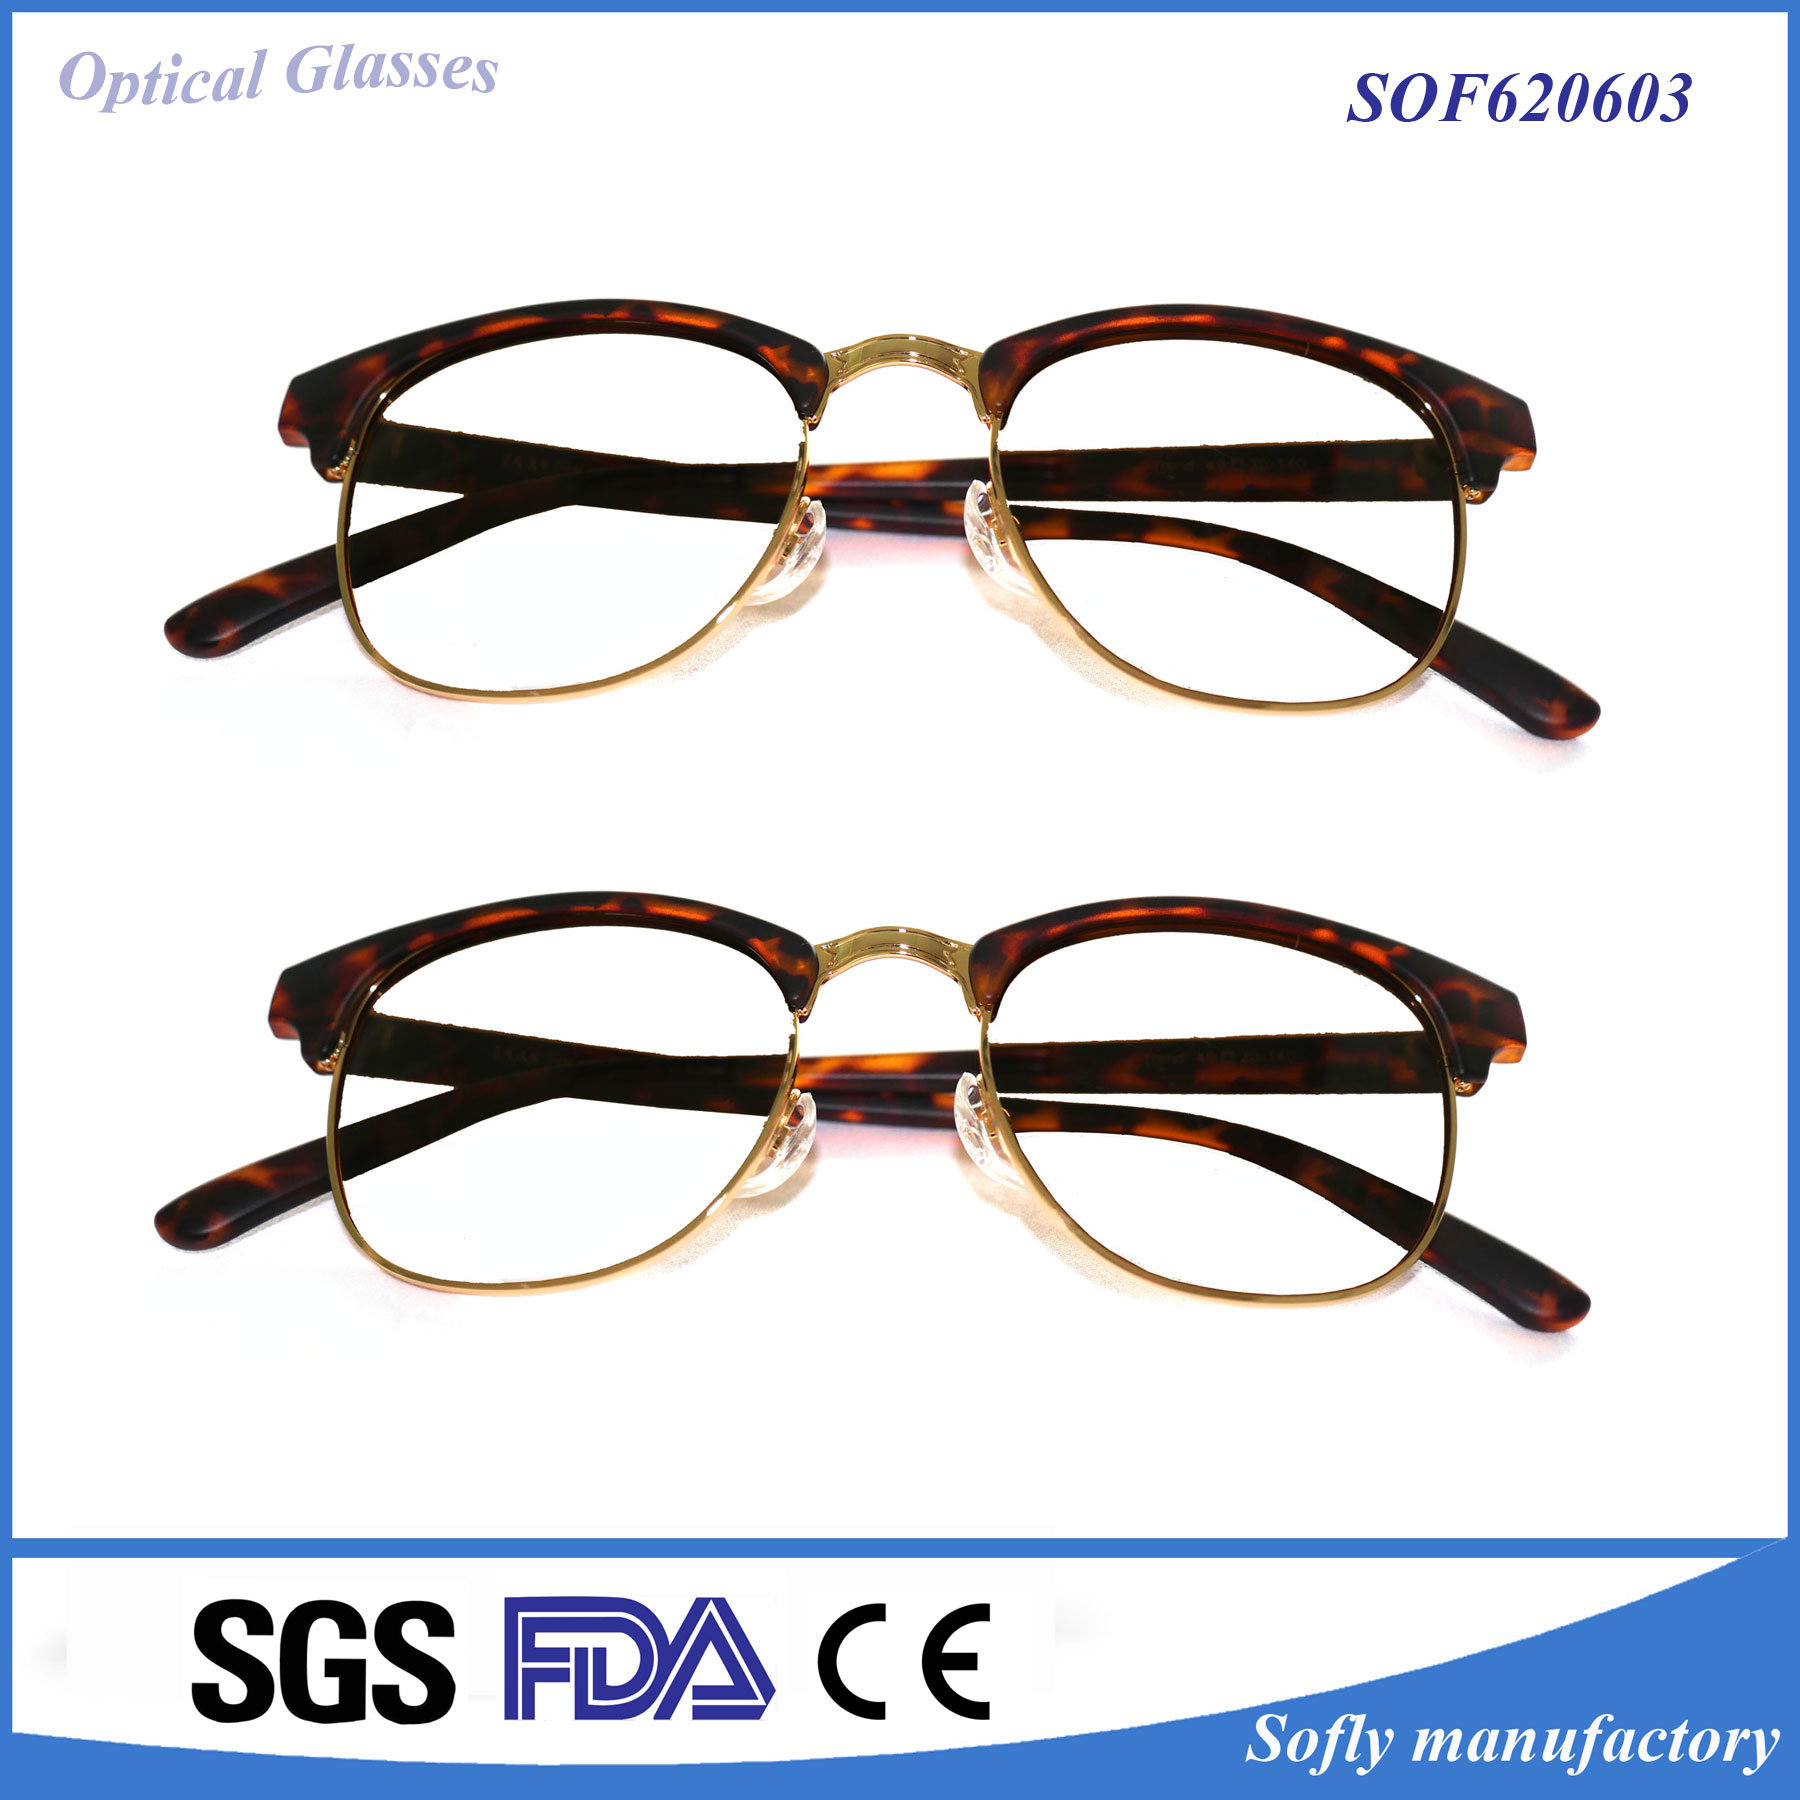 Thin/Light Fashion Design Reading/ Presbyopic Glasses